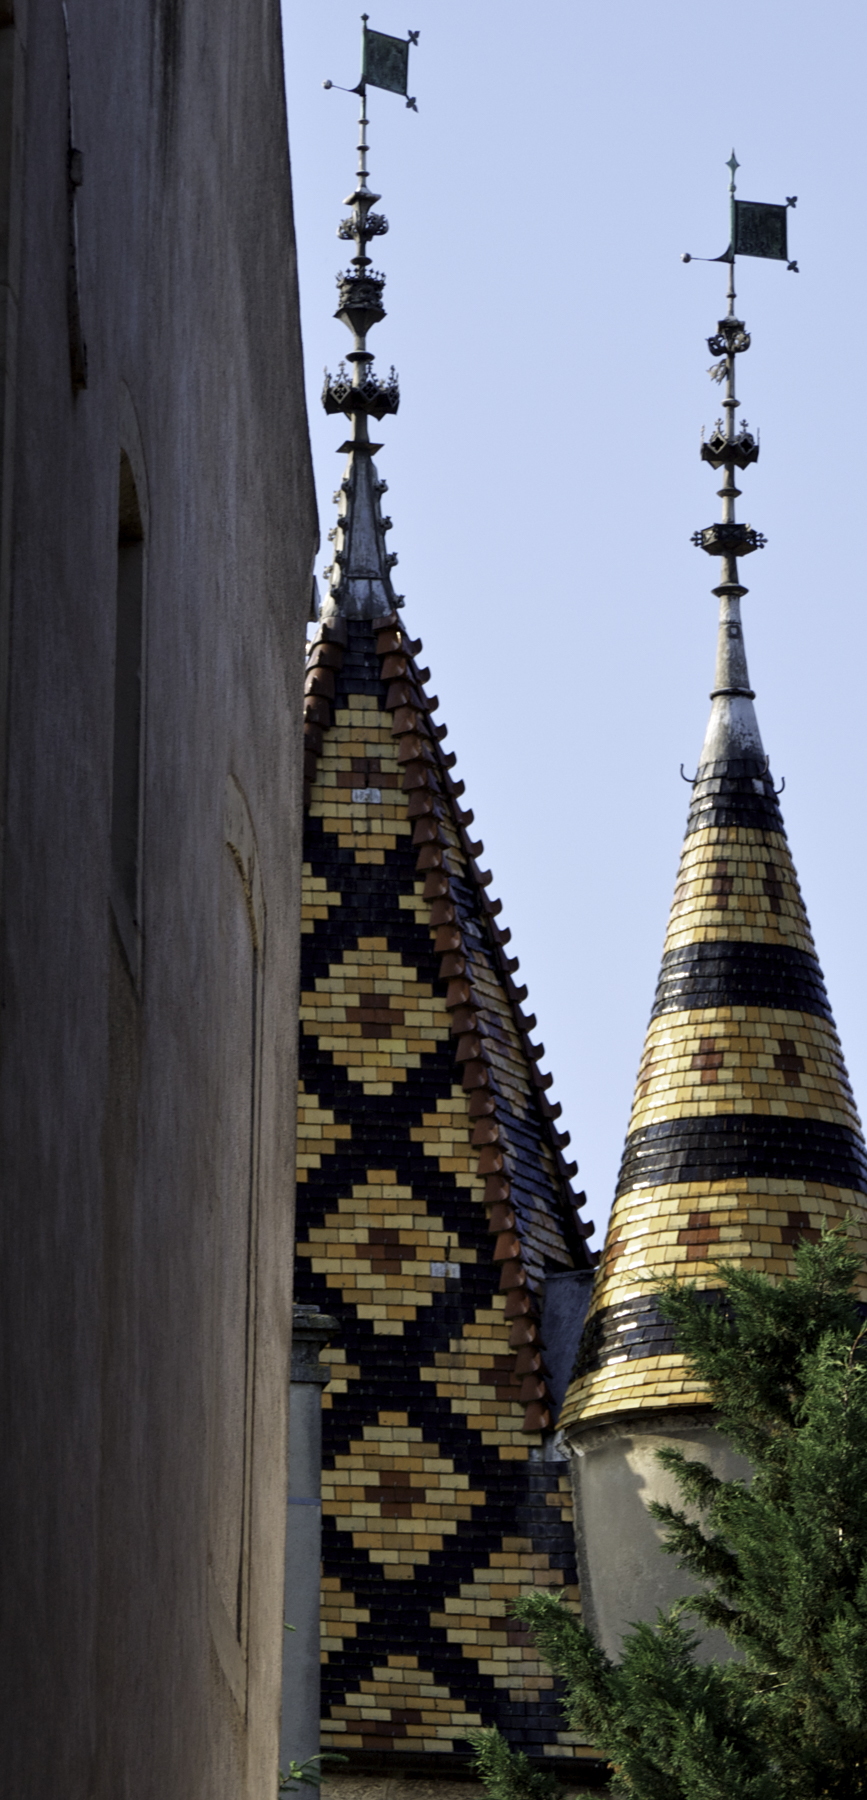 Roof Tiles, Beaune